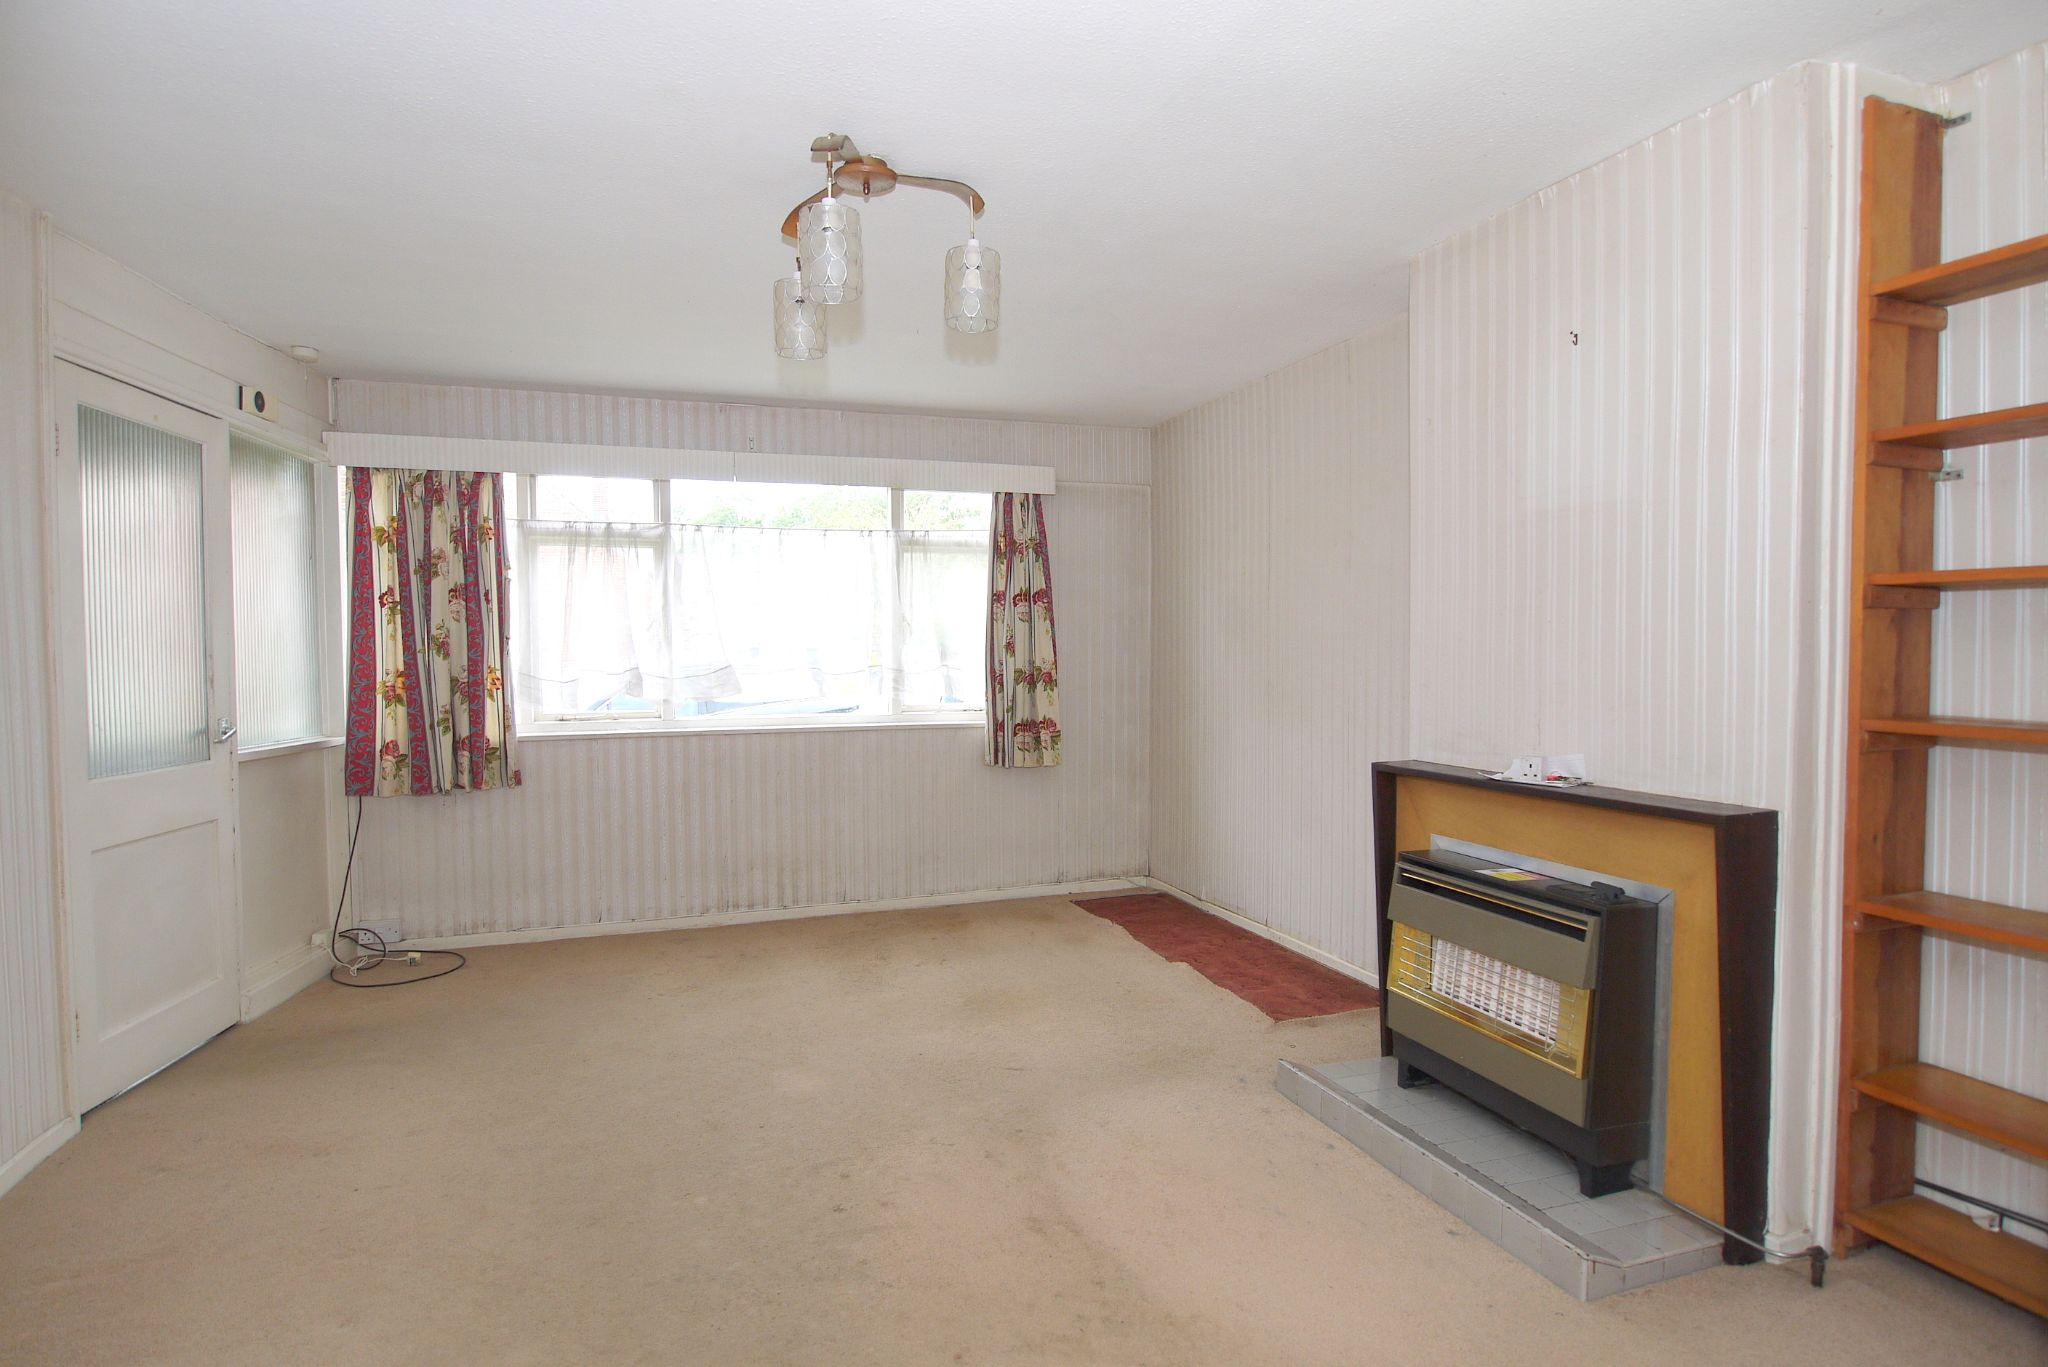 5 bedroom semi-detached house Sold in Sevenoaks - Photograph 3